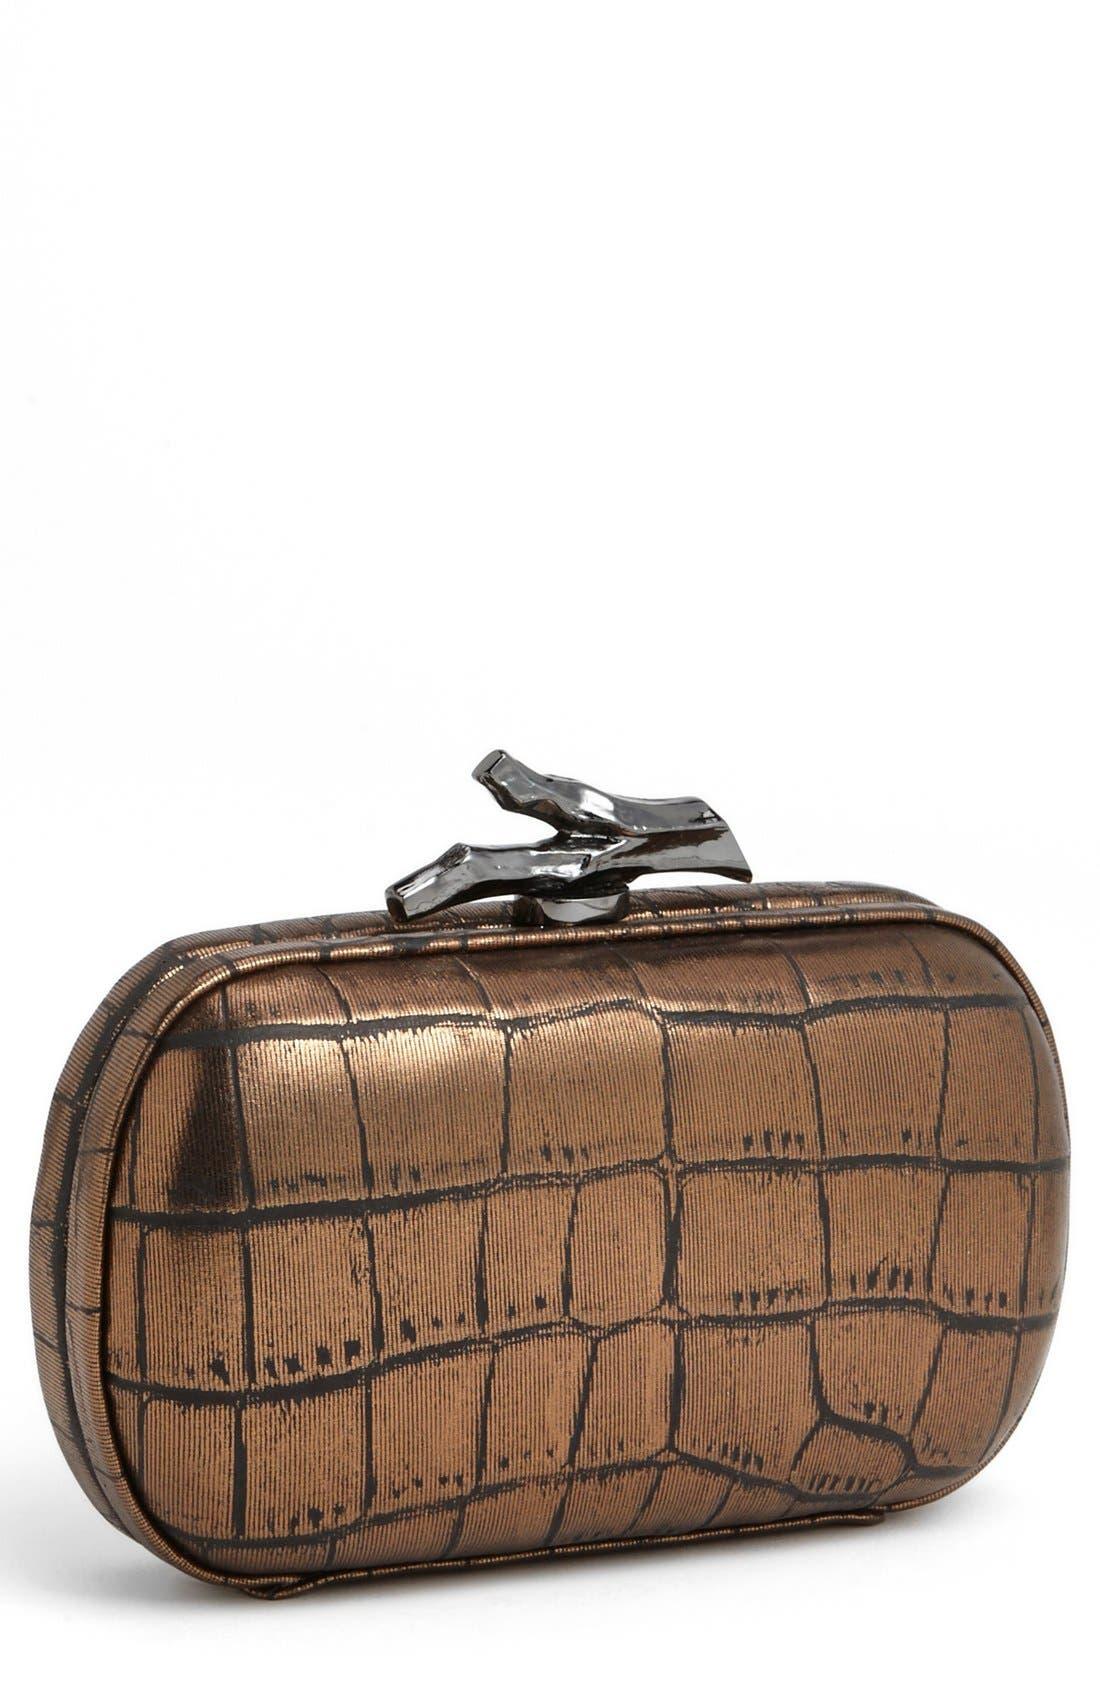 Alternate Image 1 Selected - Diane von Furstenberg 'Lytton' Embossed Metallic Leather Clutch